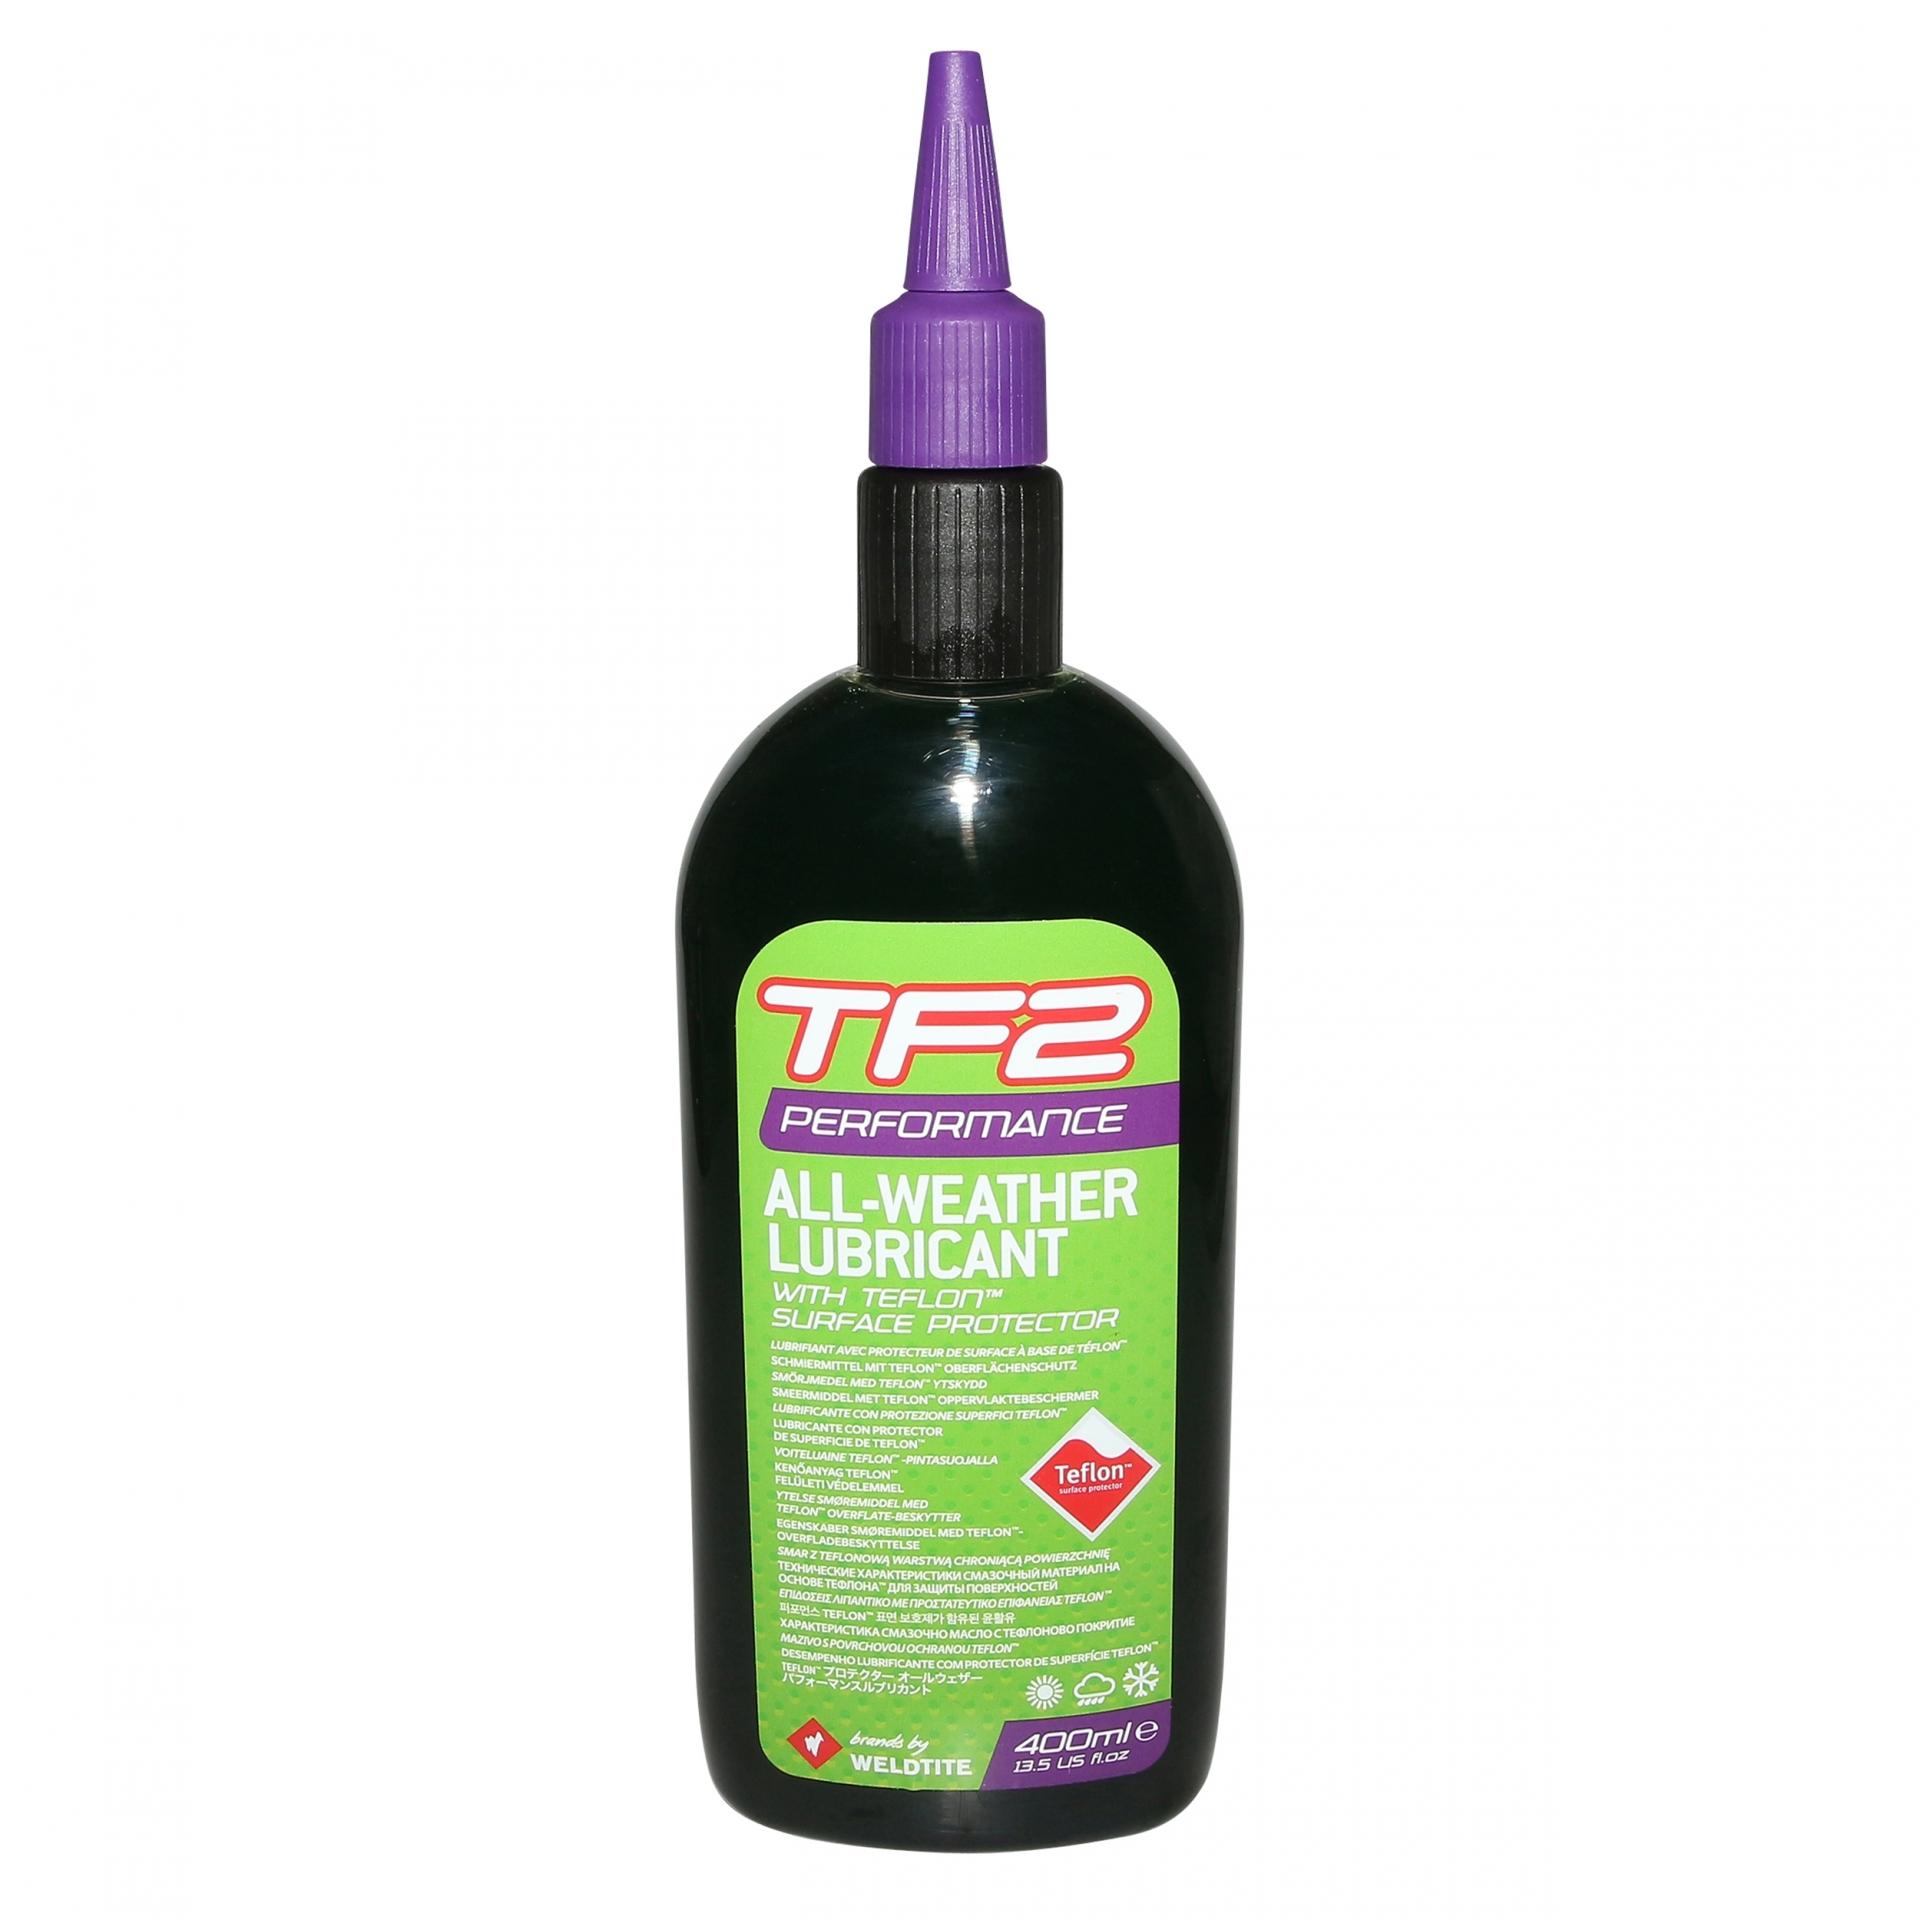 Lubrifiant chaîne Weldtite TF2 Performance toutes conditions au teflon 400 ml